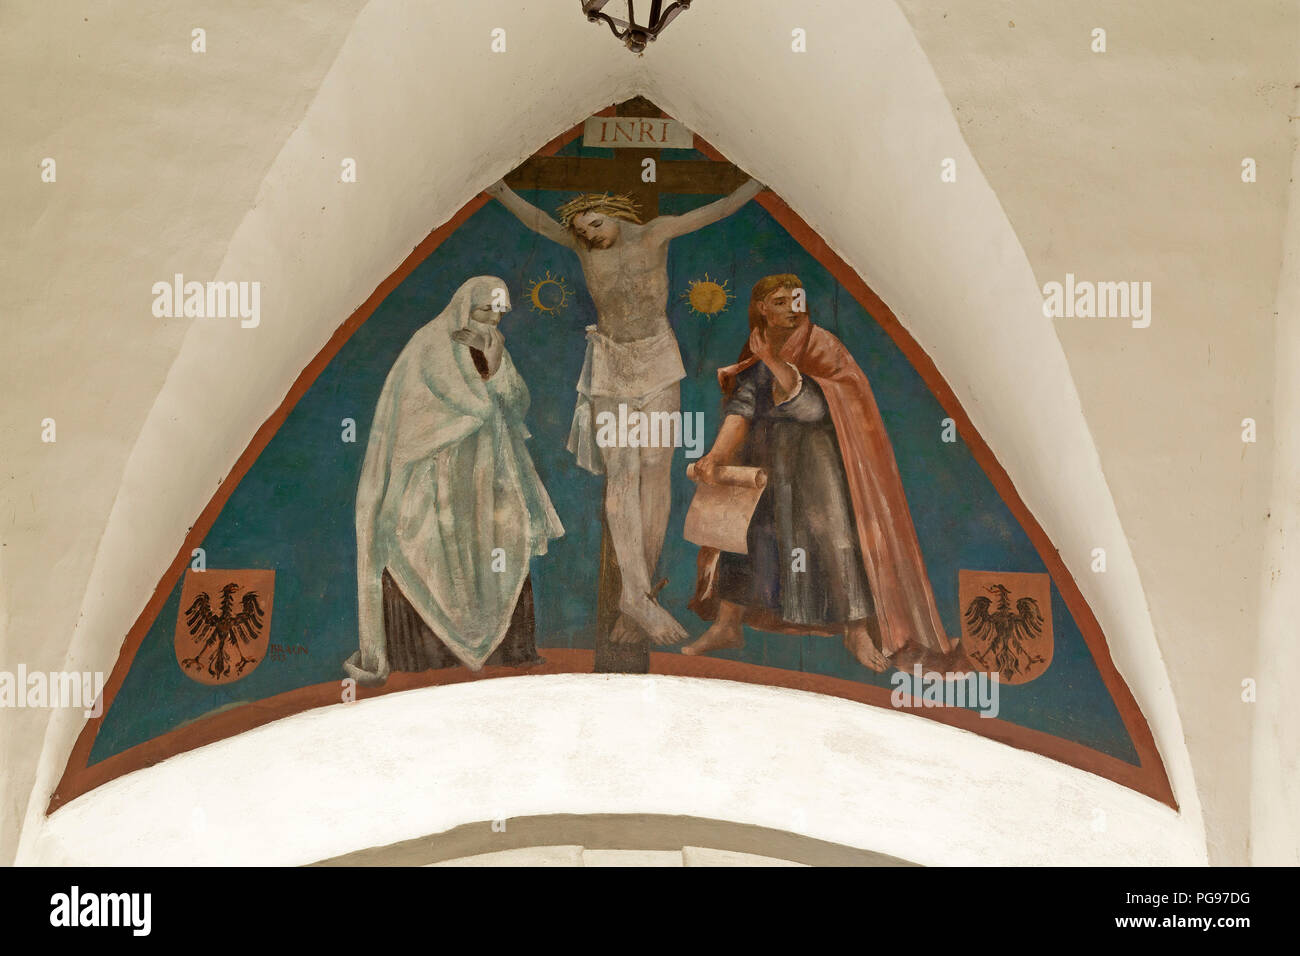 fresco, Pfaffenturm (parson´s tower), Wangen, Allgaeu, Baden-Wuerttemberg, Germany - Stock Image